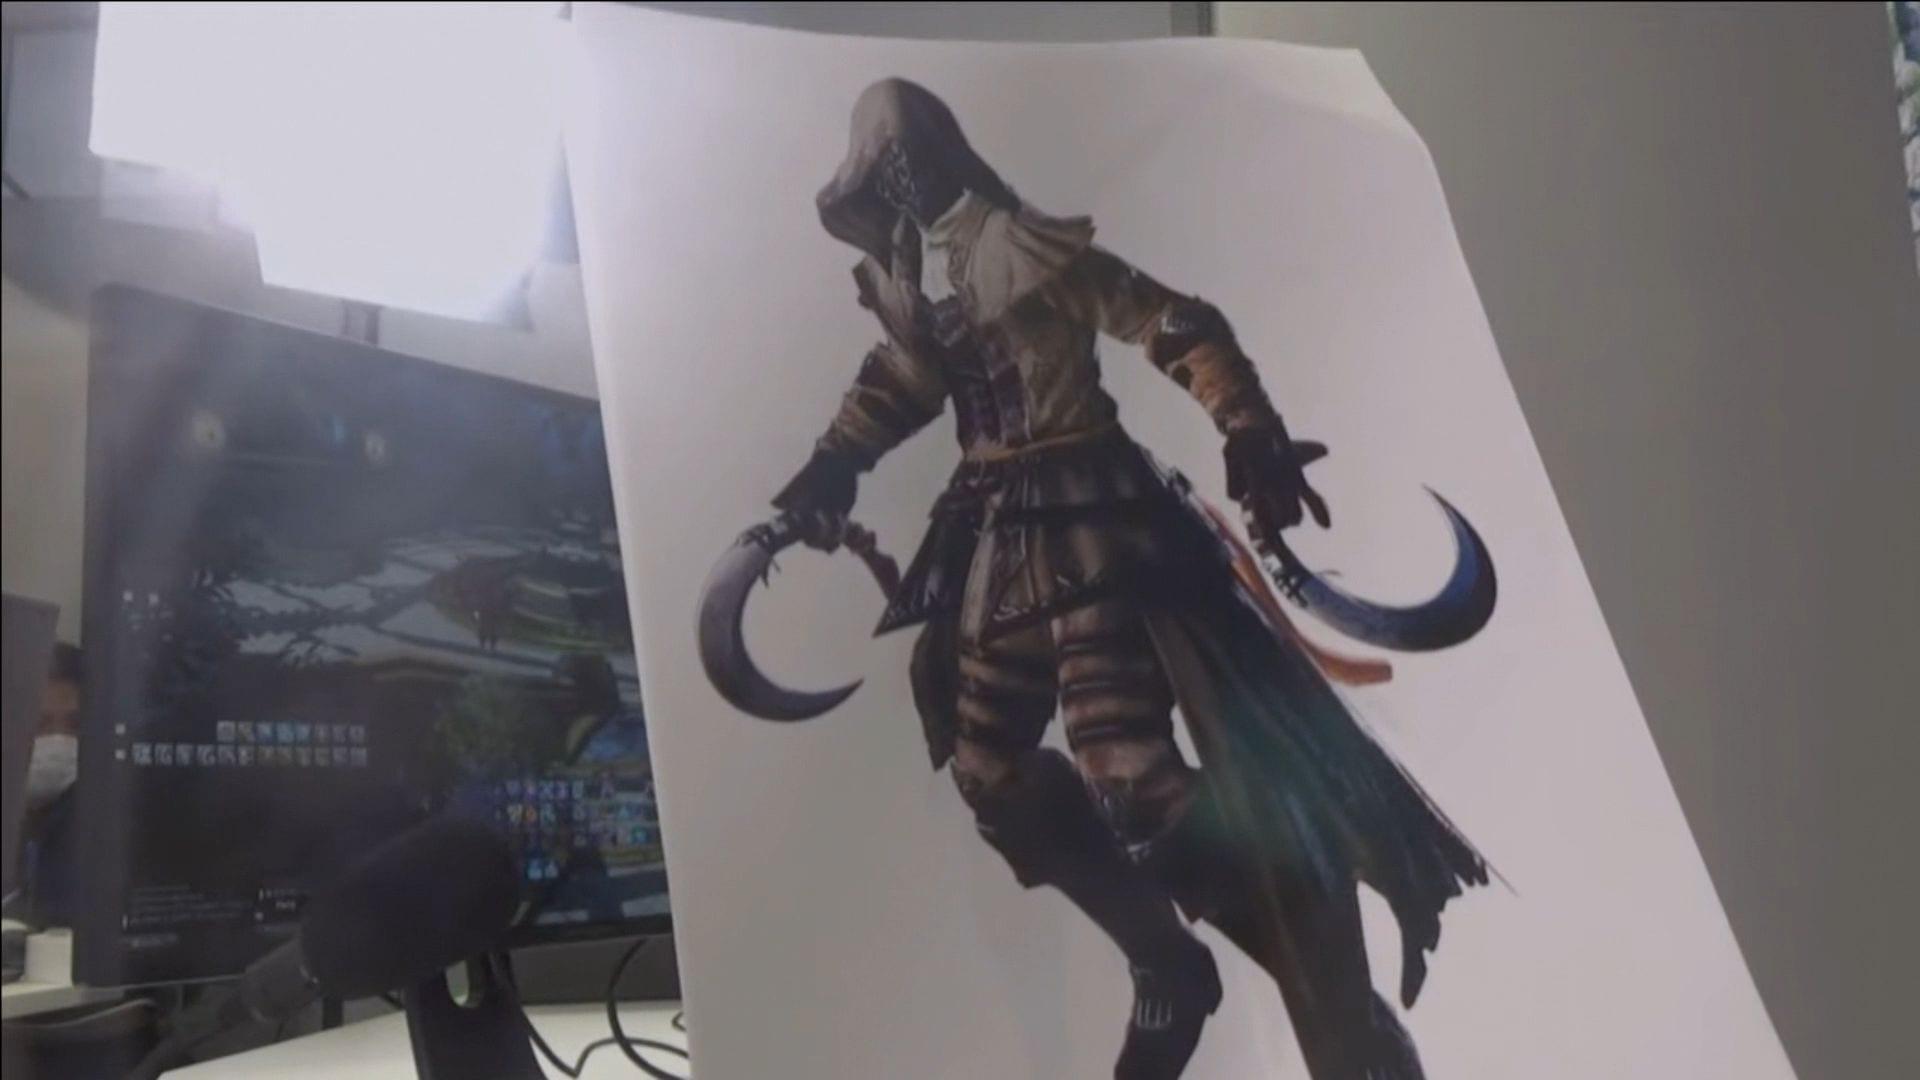 Final-Fantasy-XIV-Screenshot-2020-11-27-13-38-10.jpg